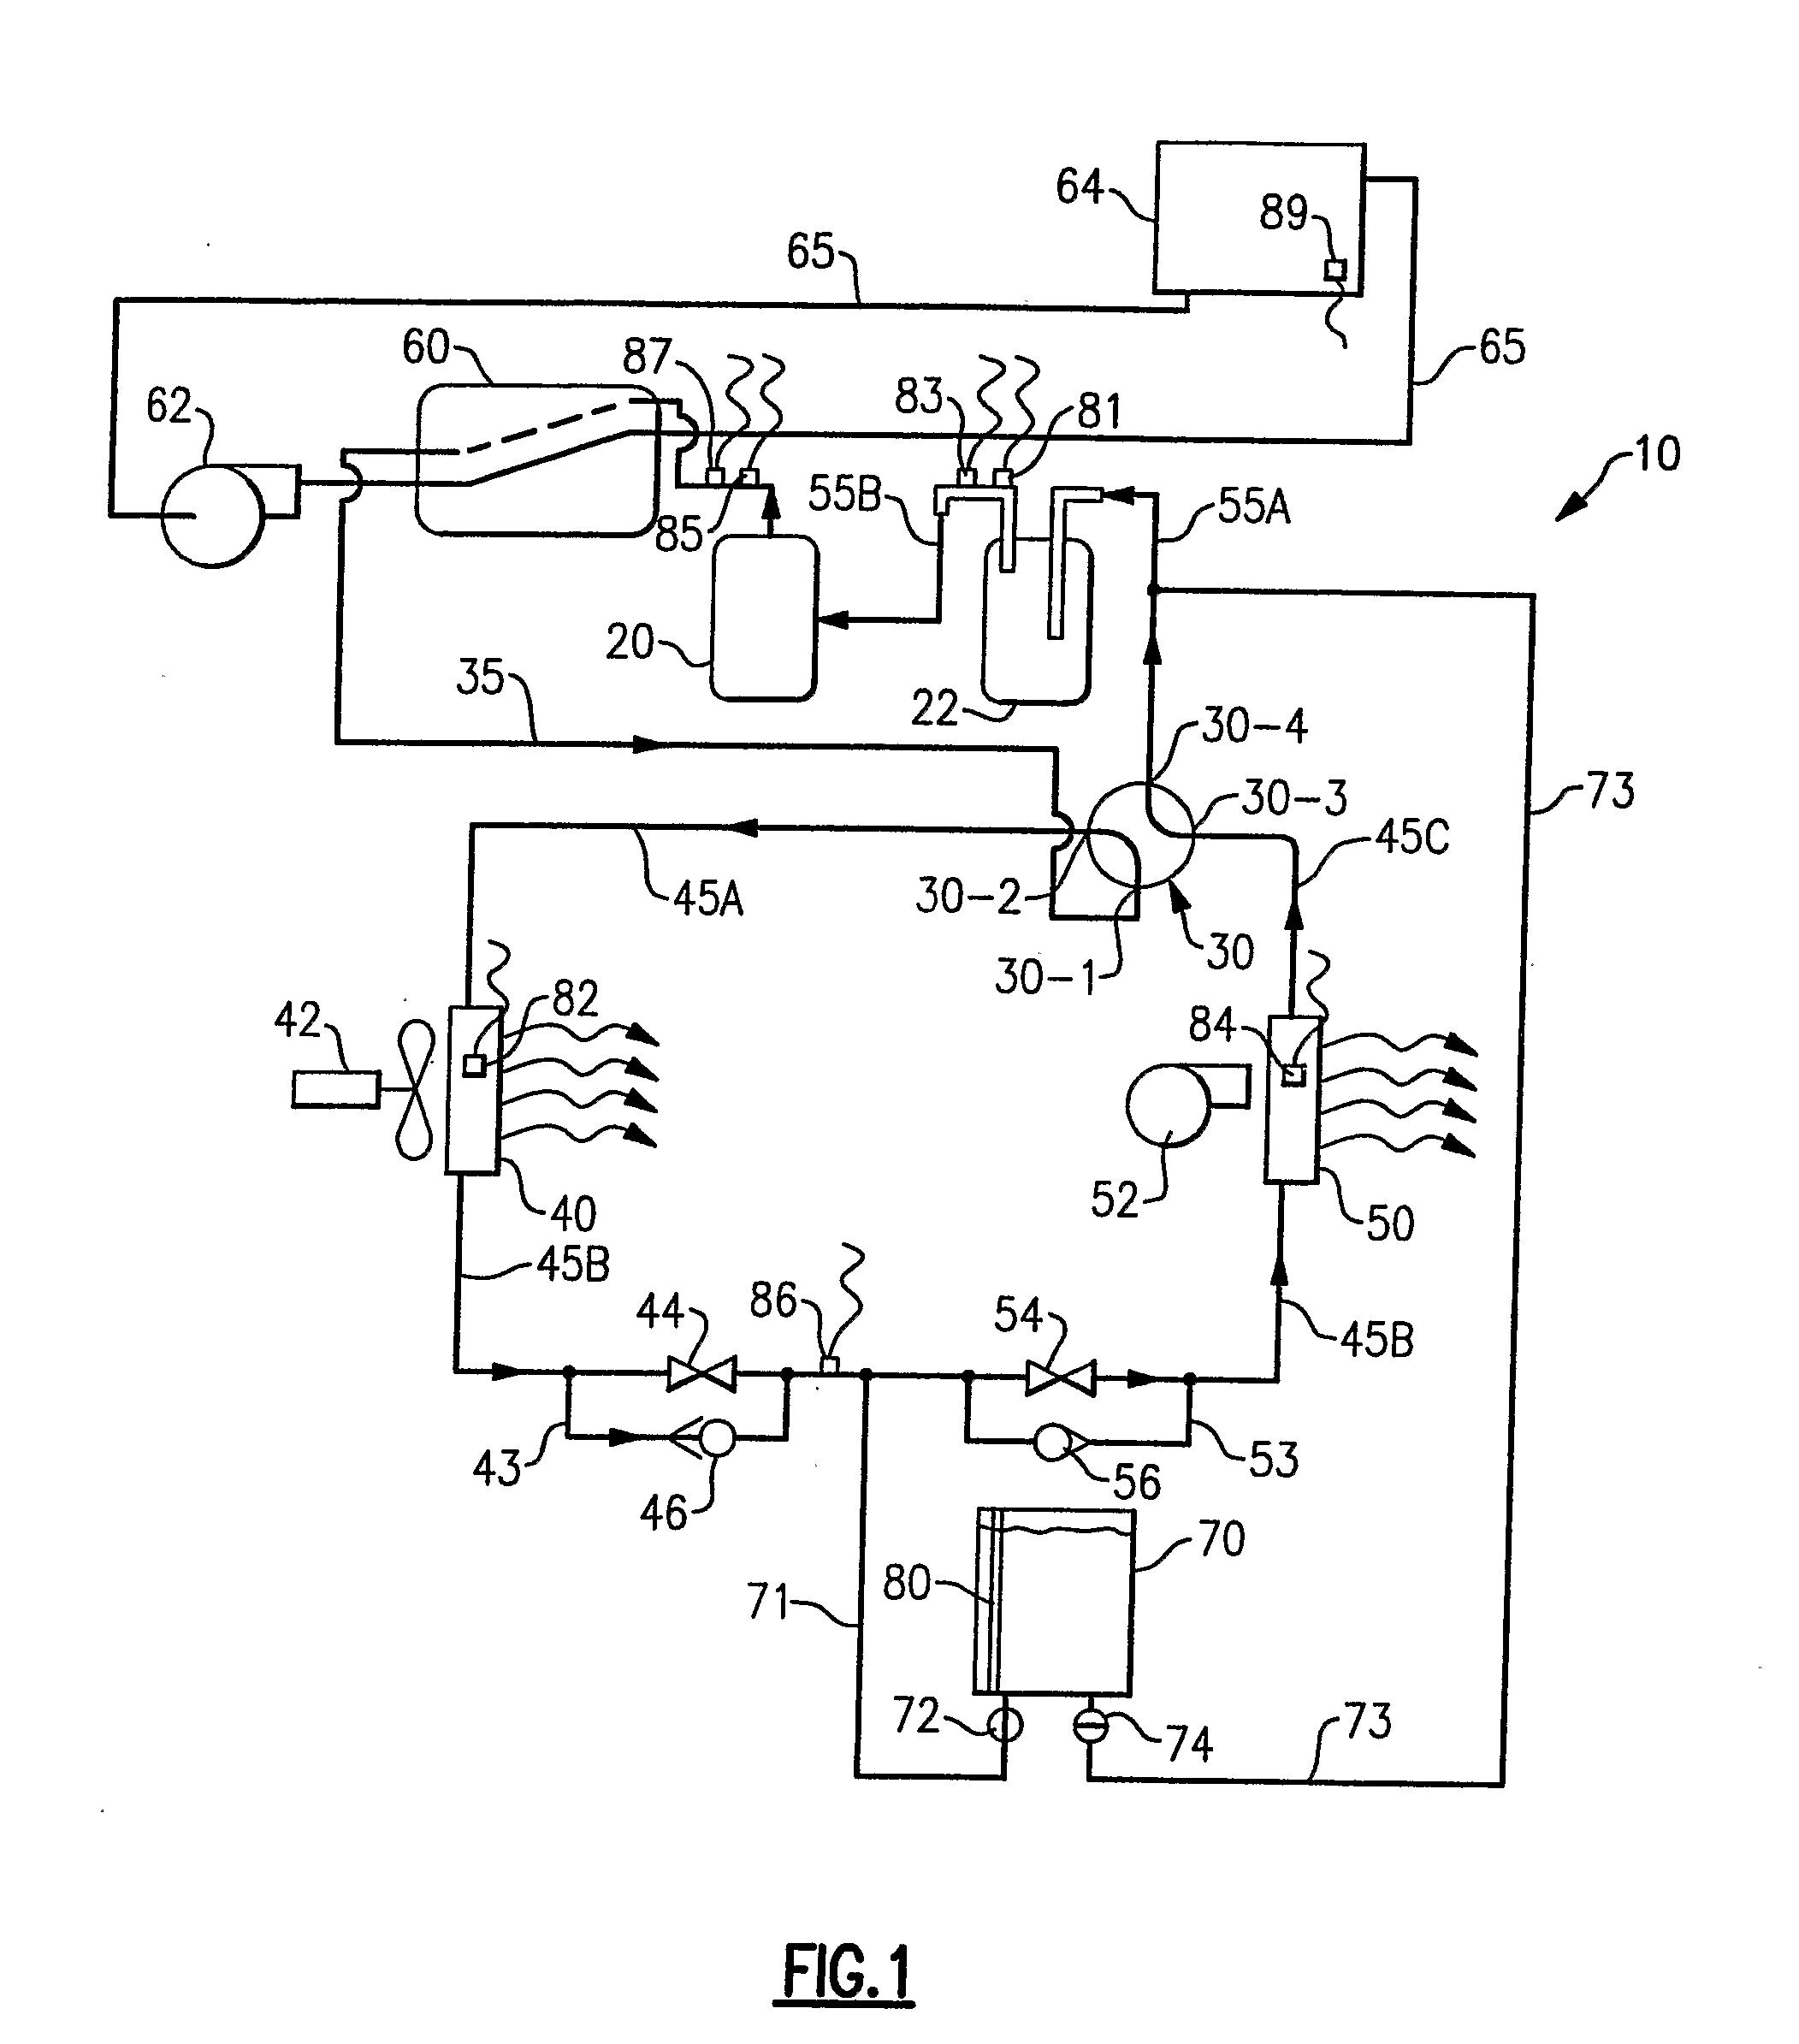 Nordyne Wiring Schematics – Nordyne Furnace Wiring Diagram